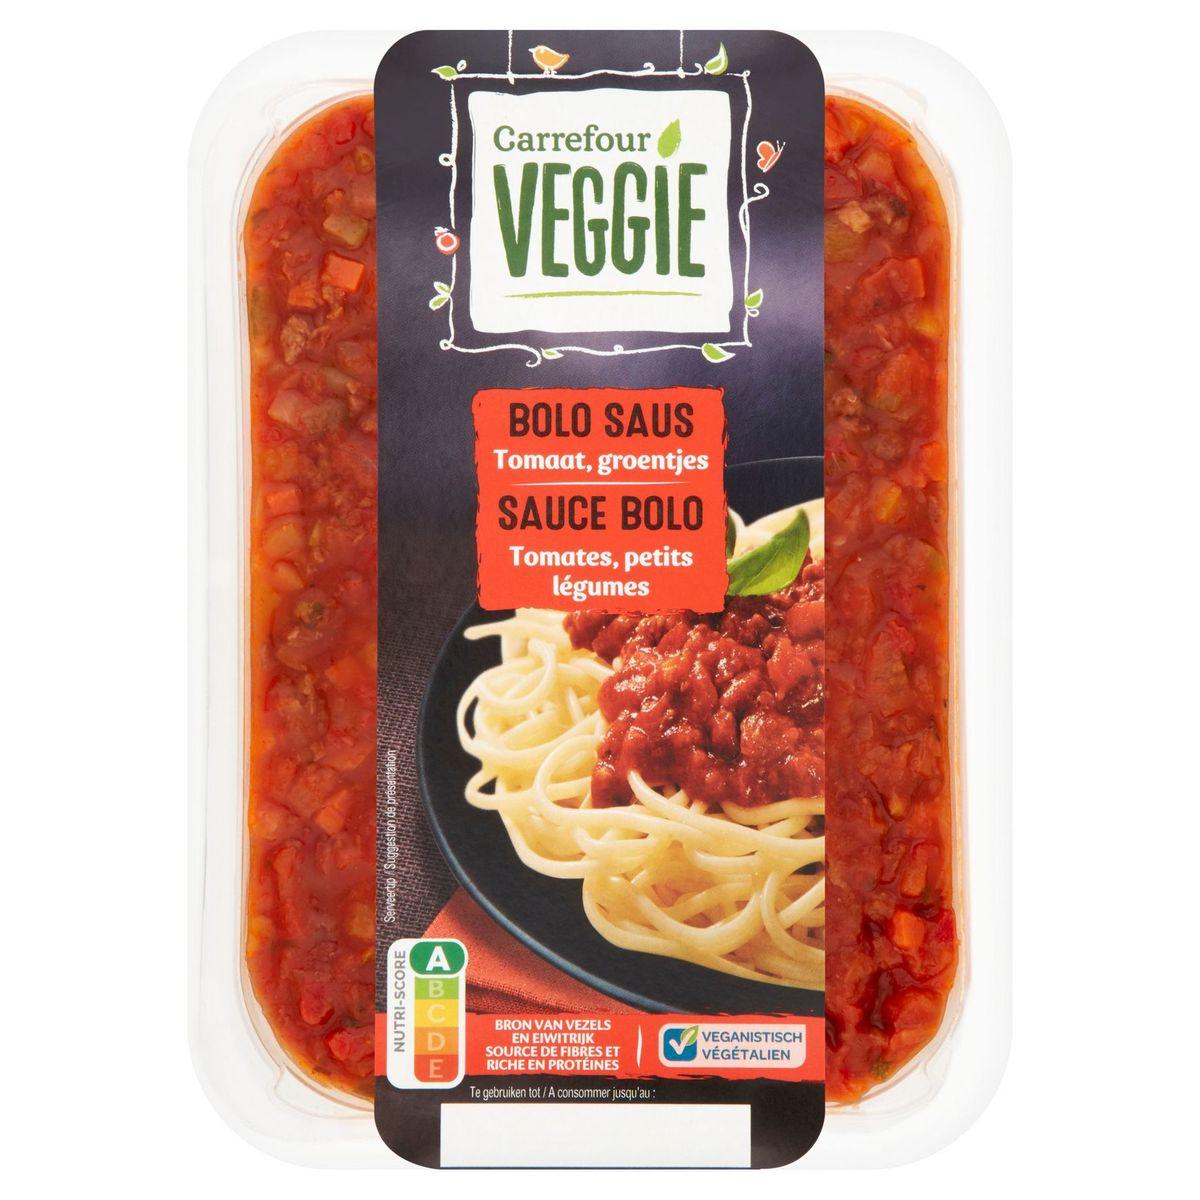 Carrefour Veggie Sauce Bolo Tomates, Petits Légumes 500 g